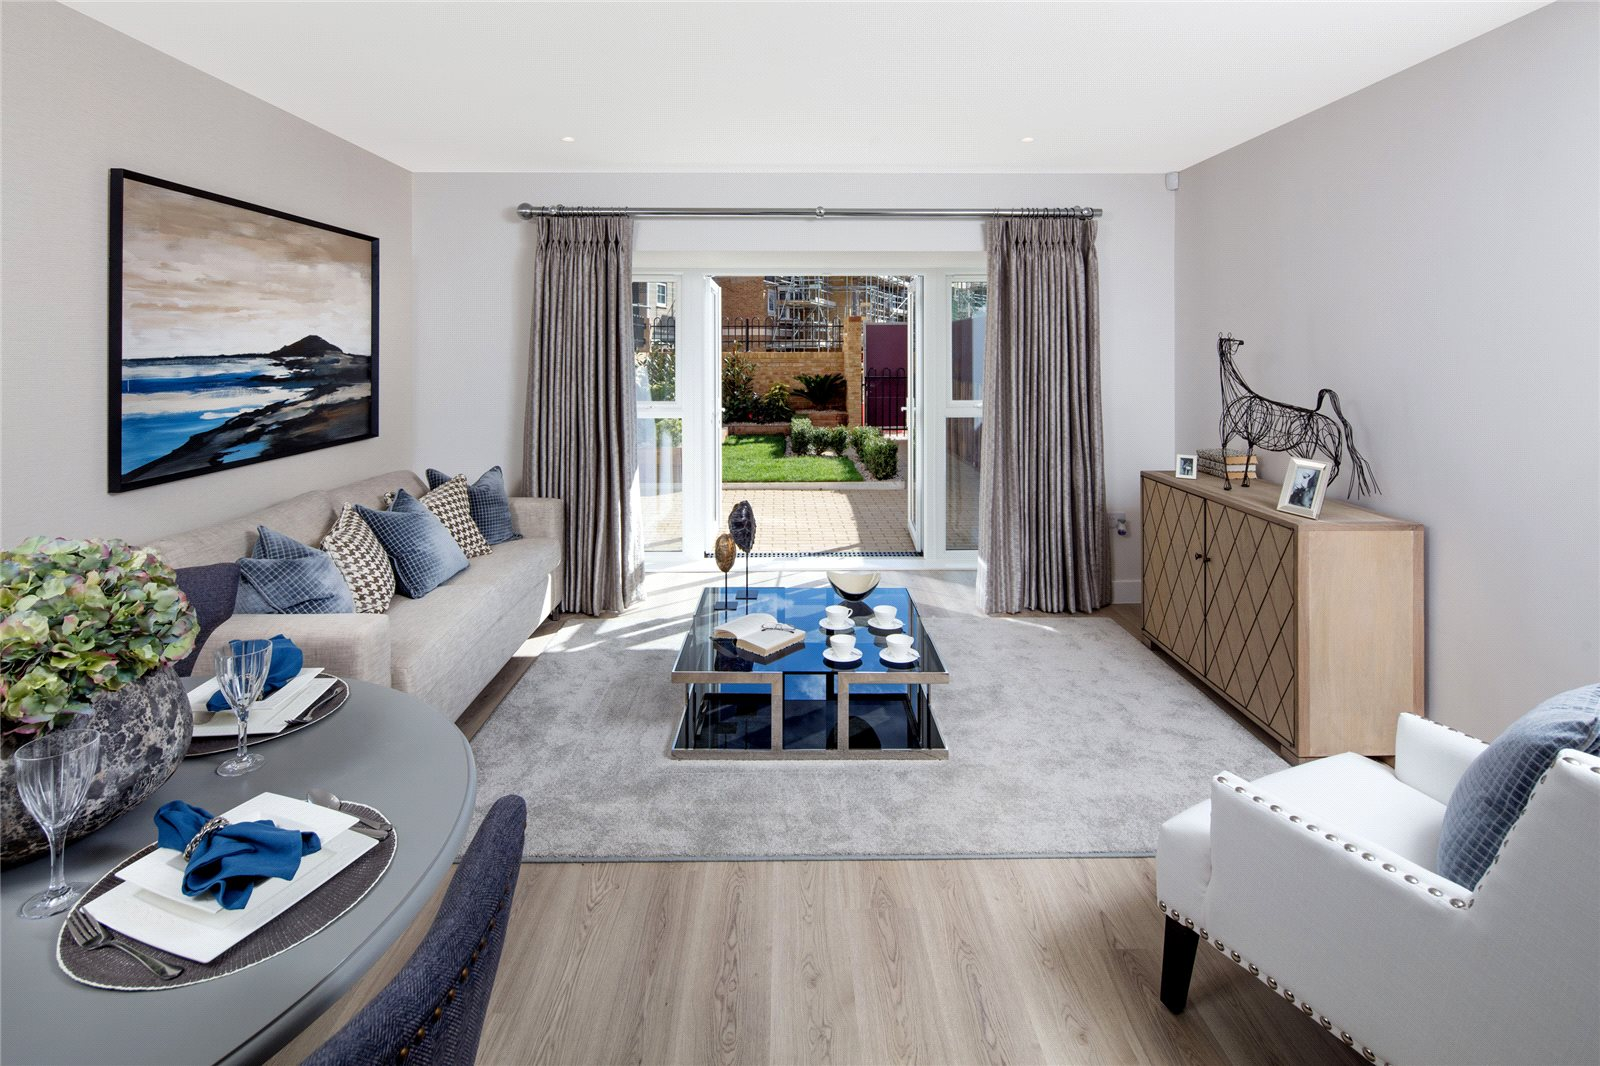 Prime Place,Lounge